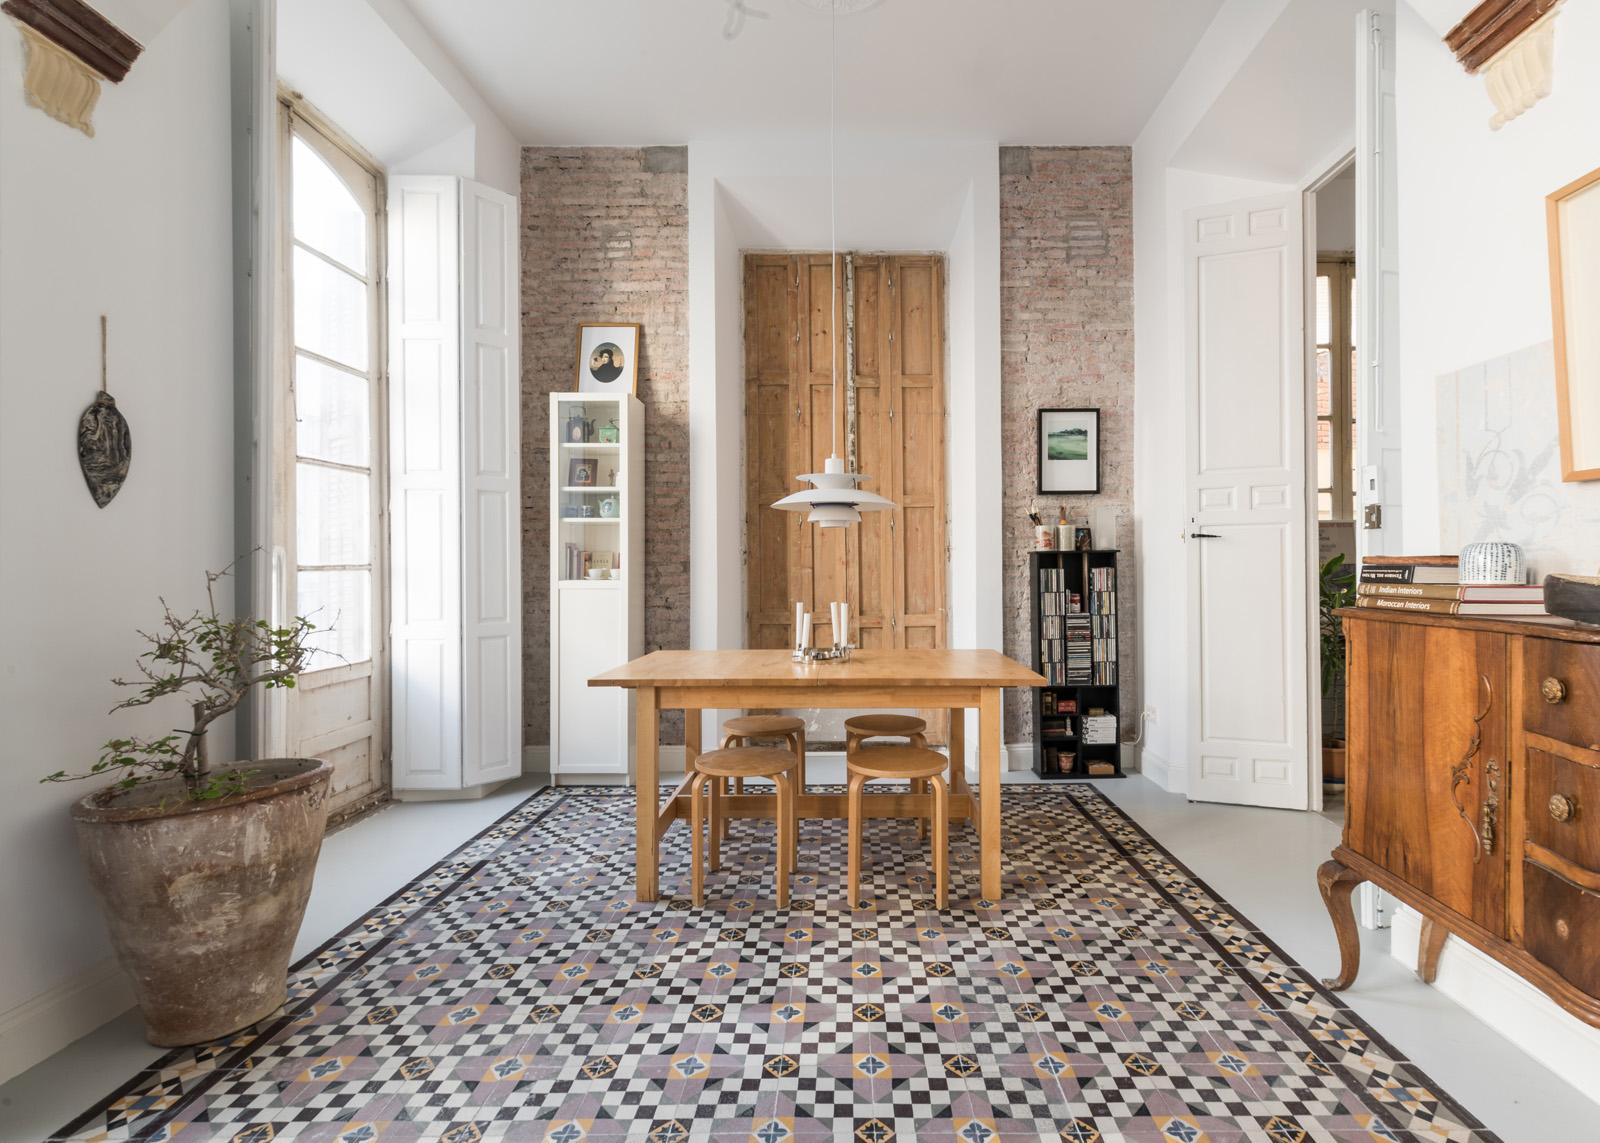 Fotografo de arquitectura e interiores en Málaga. Piso piloto de lujo de inmobiliaria en el centro histórico de Málaga